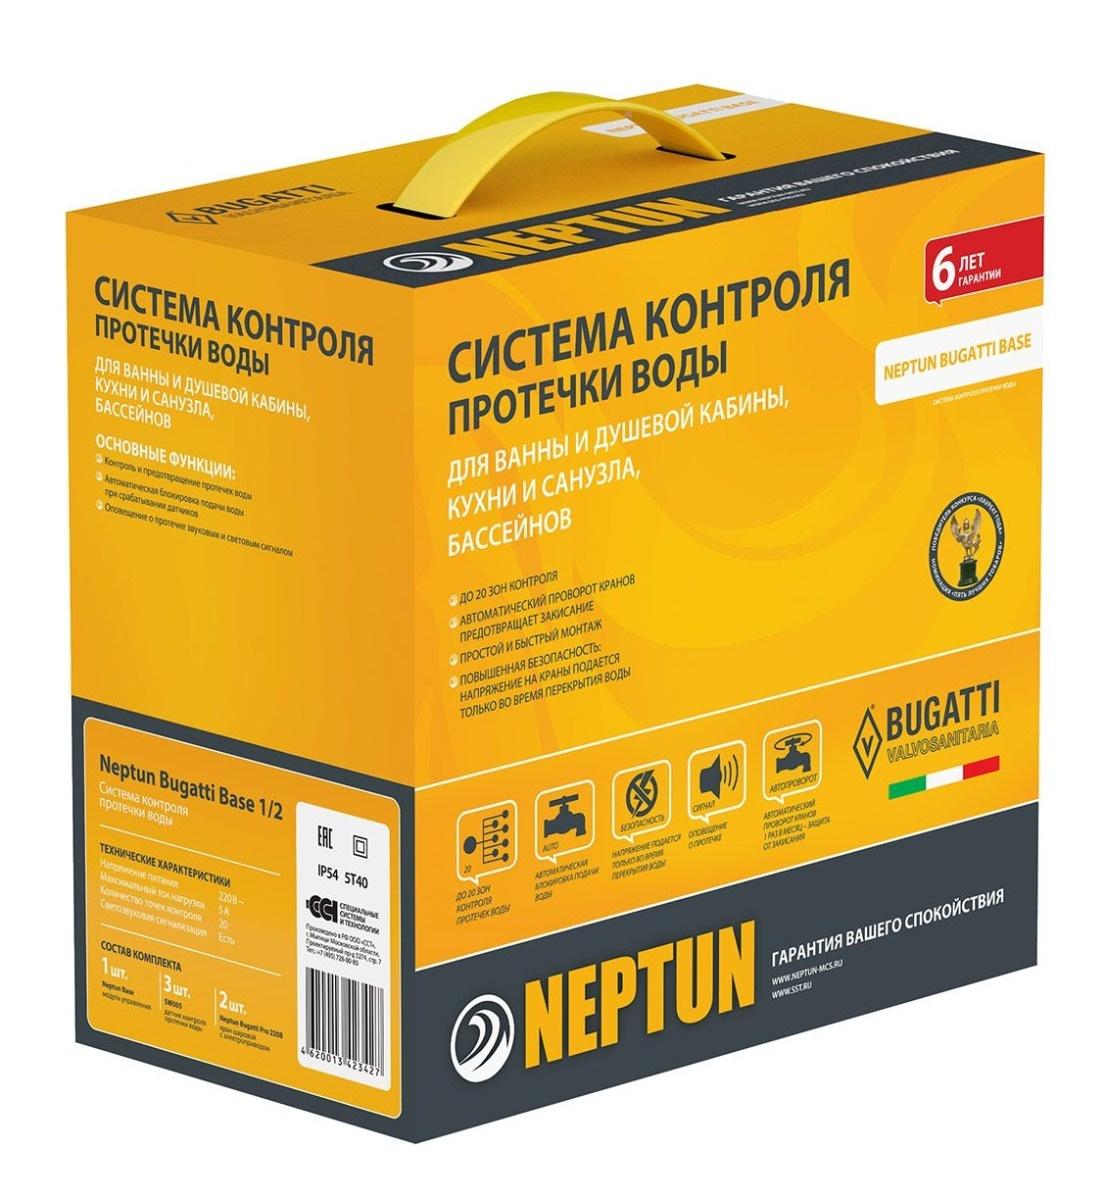 Neptun Bugatti Base 3/4 Система защиты от протечек воды